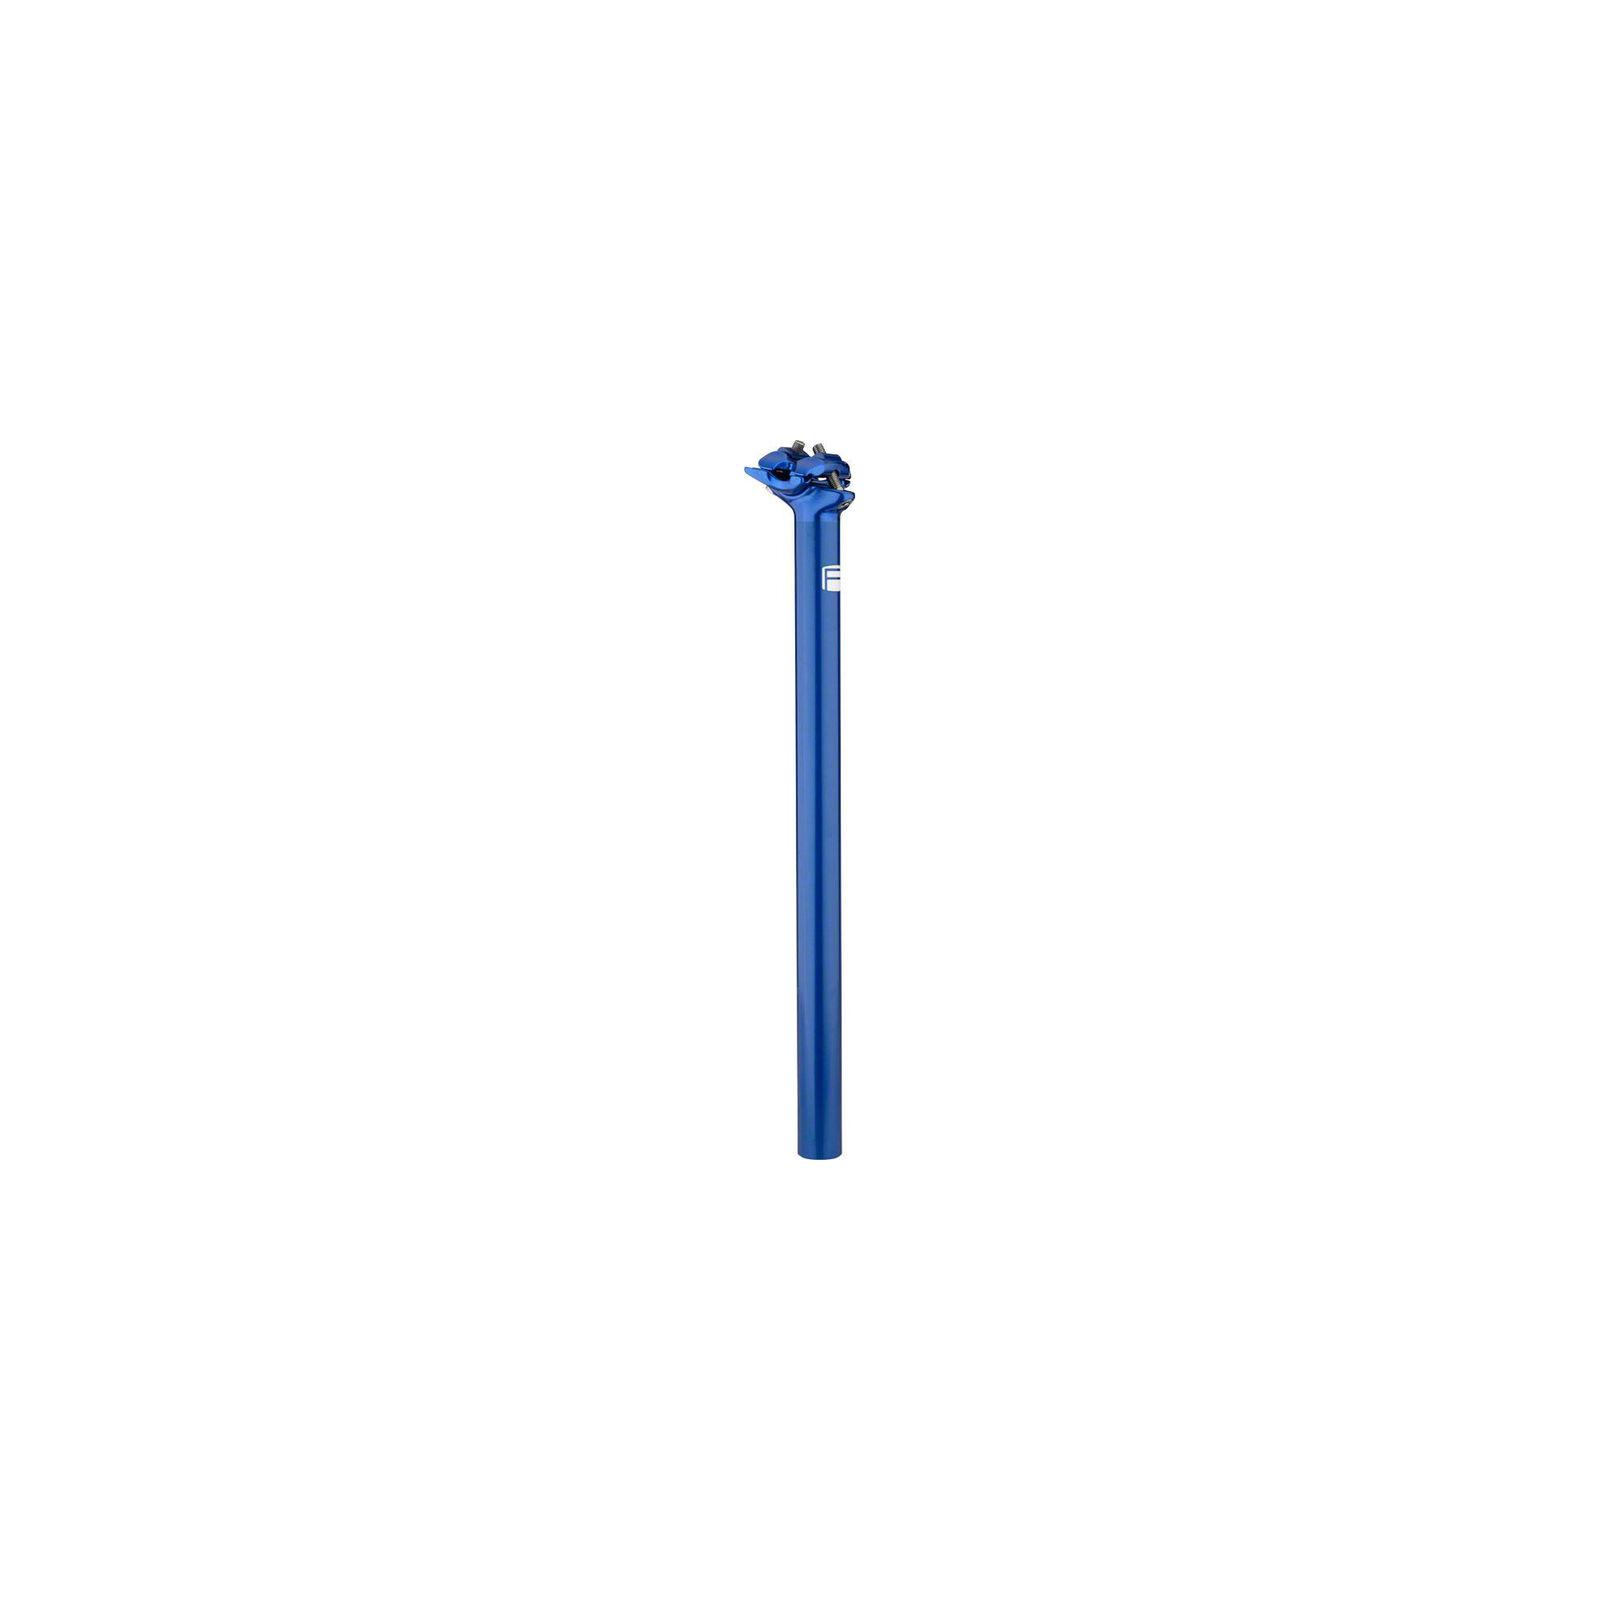 Promax SP-1 Seatpost 27.2 x 400mm bluee